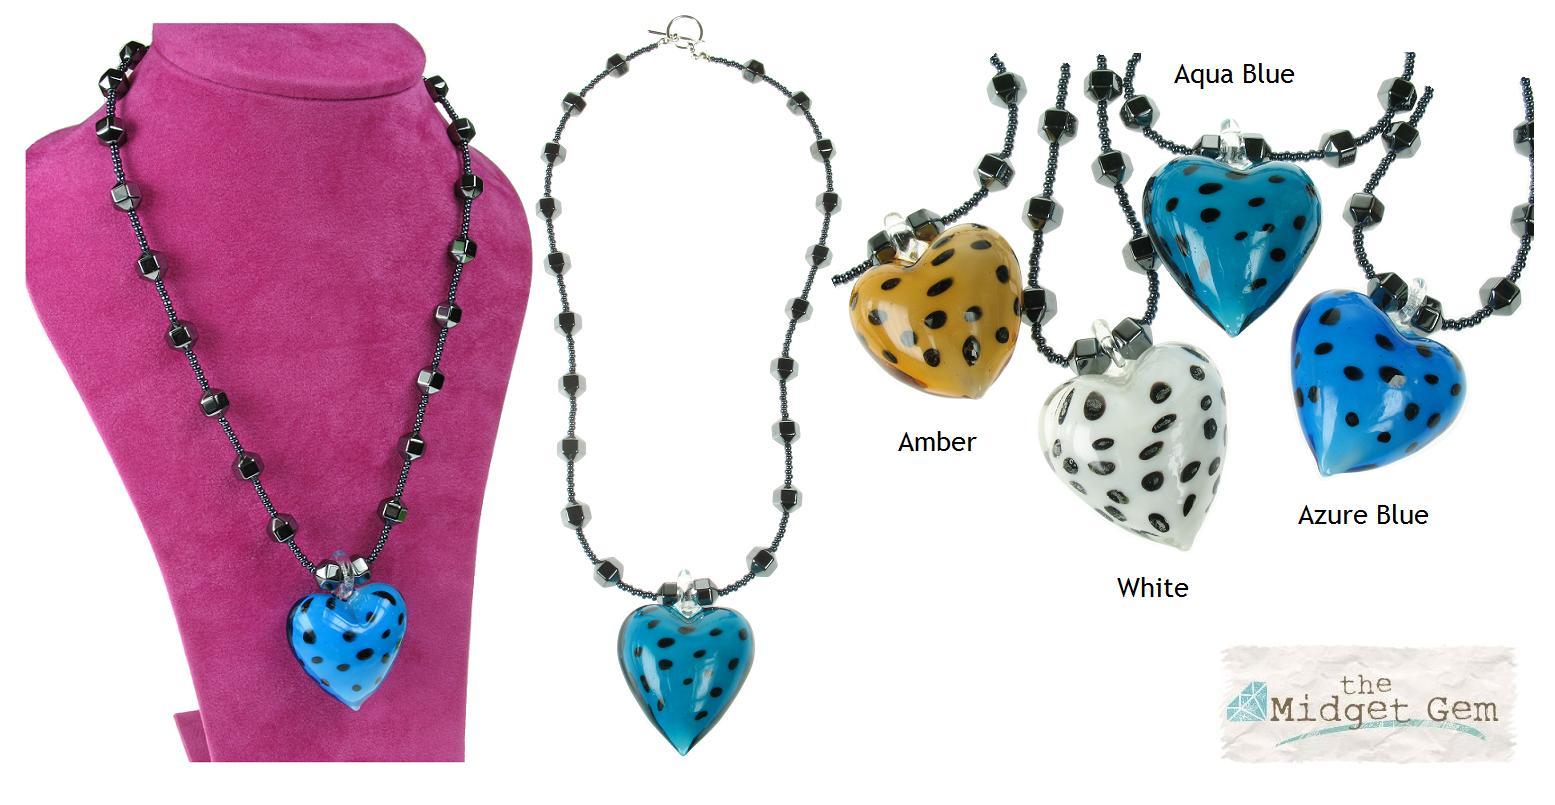 PINK Hematite & Polka Dot Glass Heart Necklace